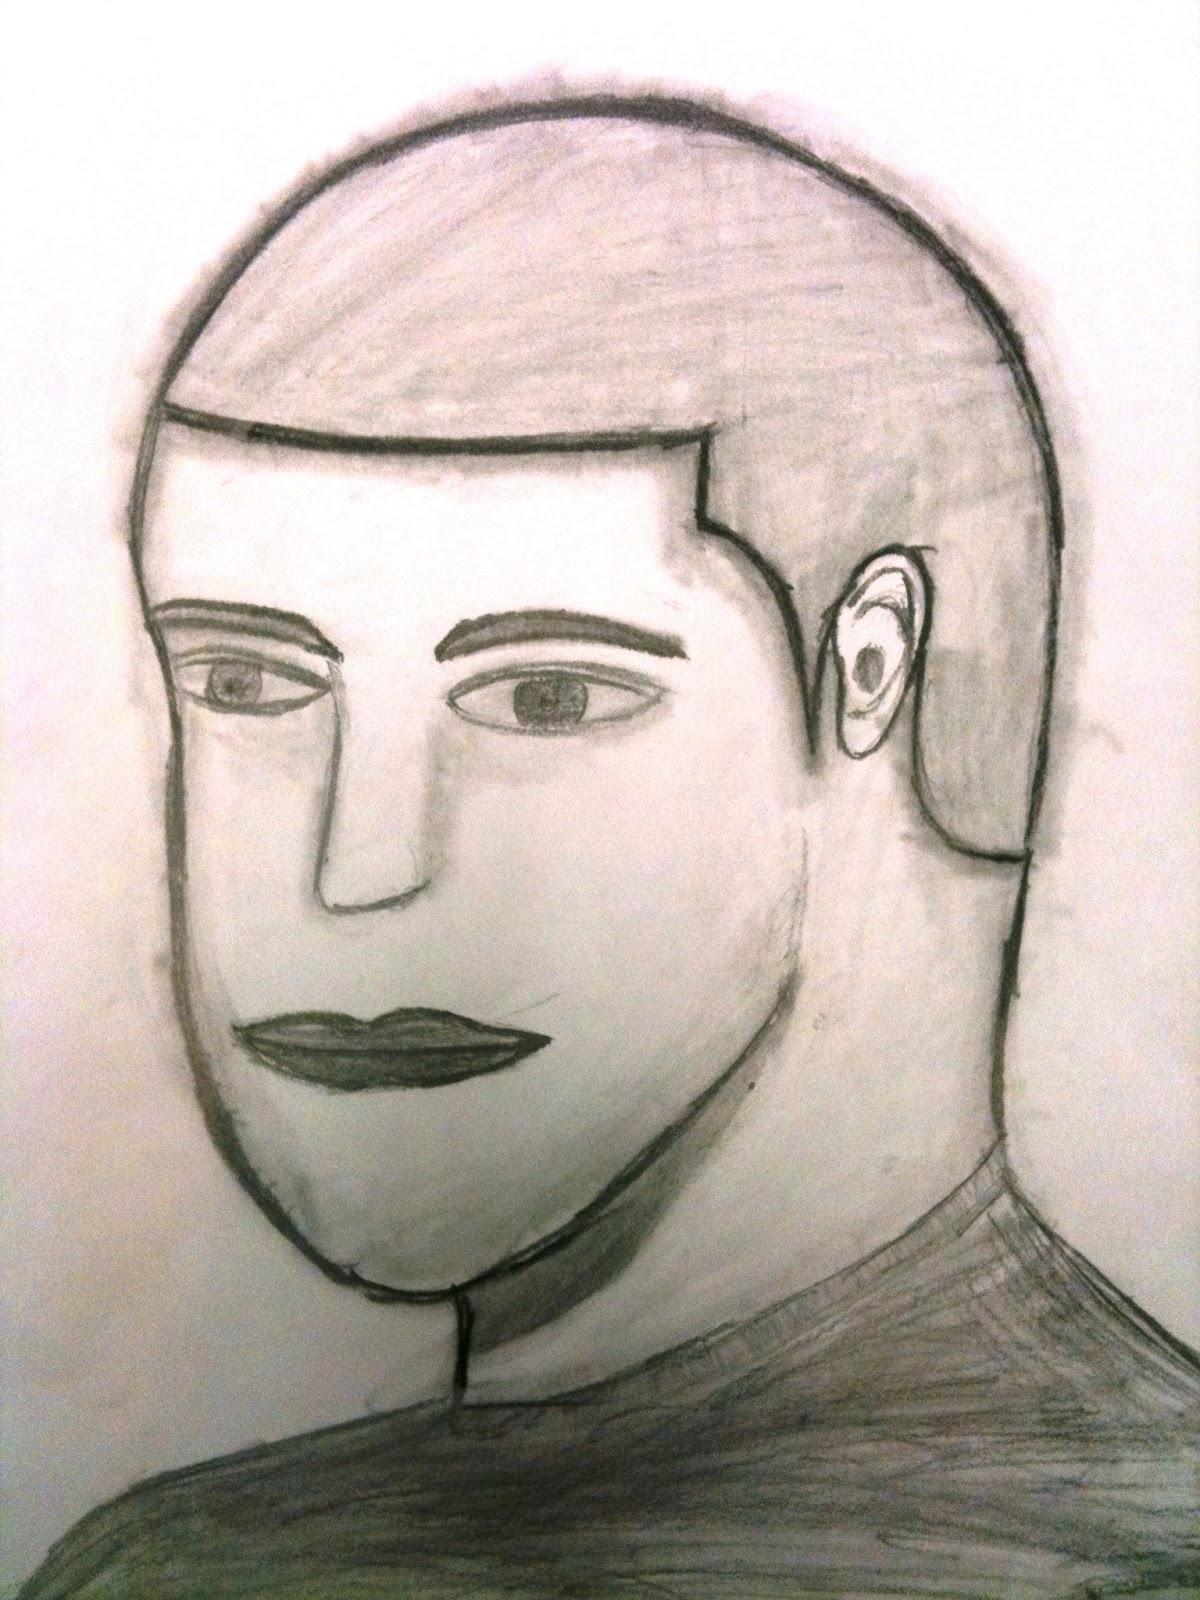 1200x1600 Human Faces Drawings Drawn Face Human Face